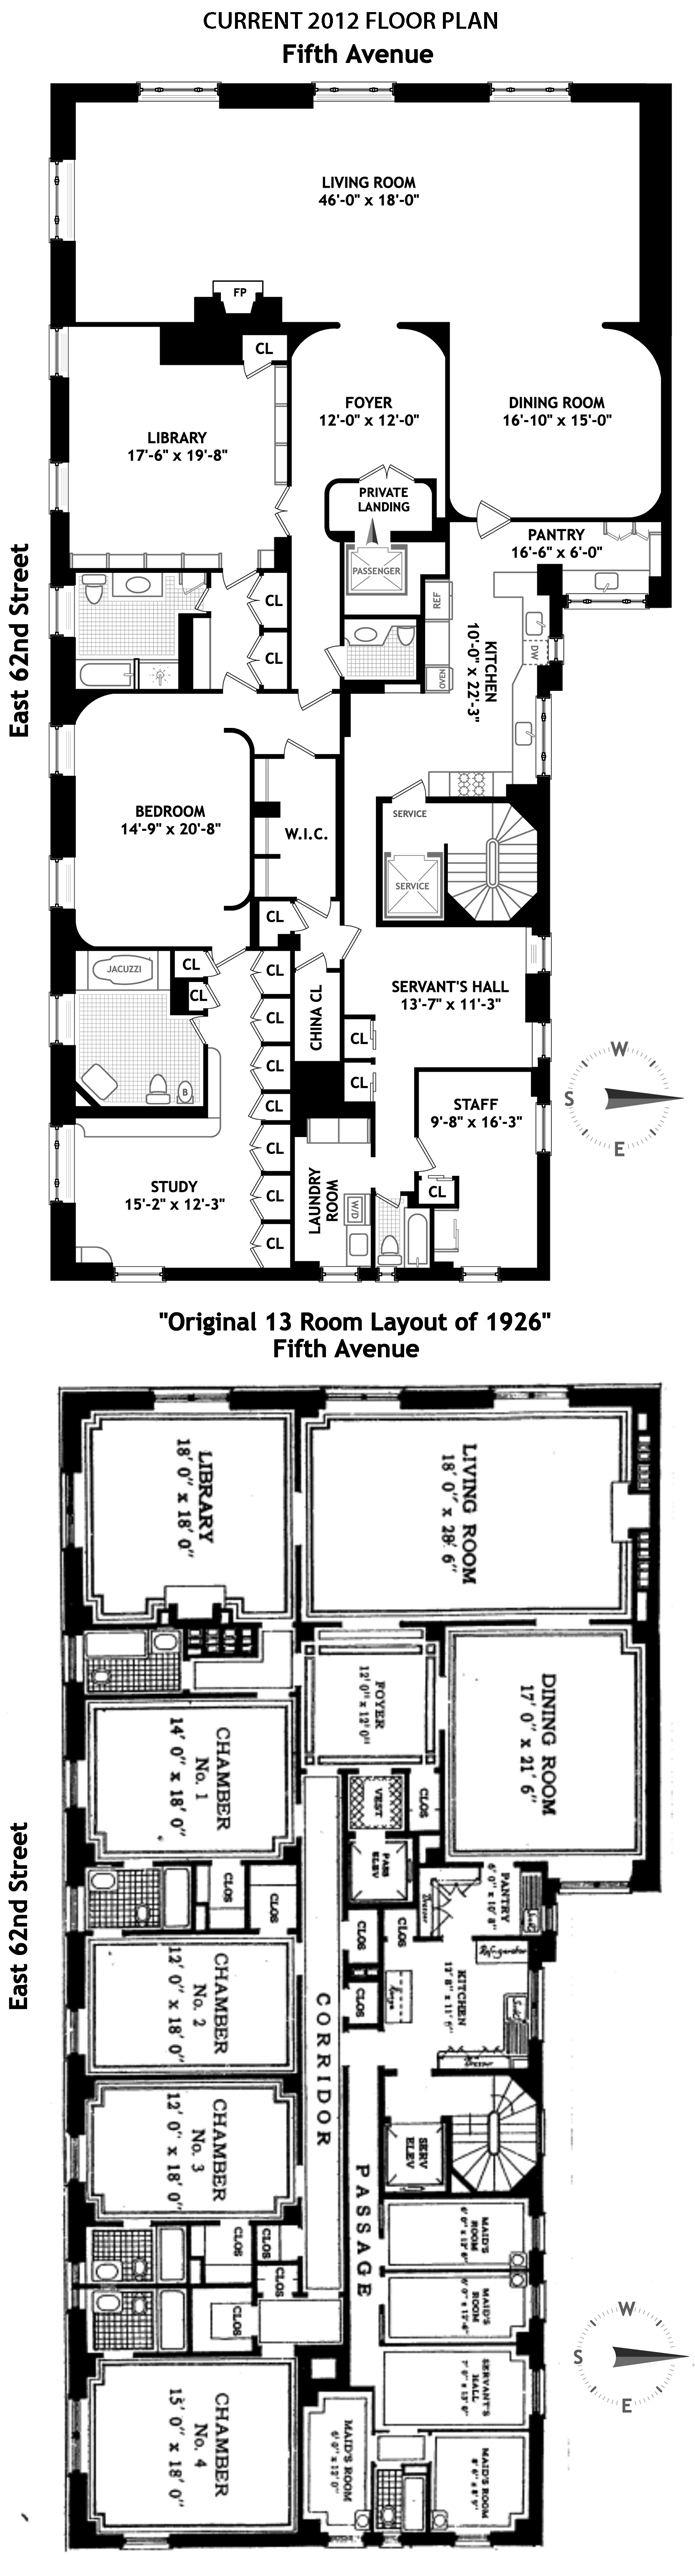 810 Fifth Avenue Brown Harris Stevens Luxury Residential Real Estate 810 Fifth